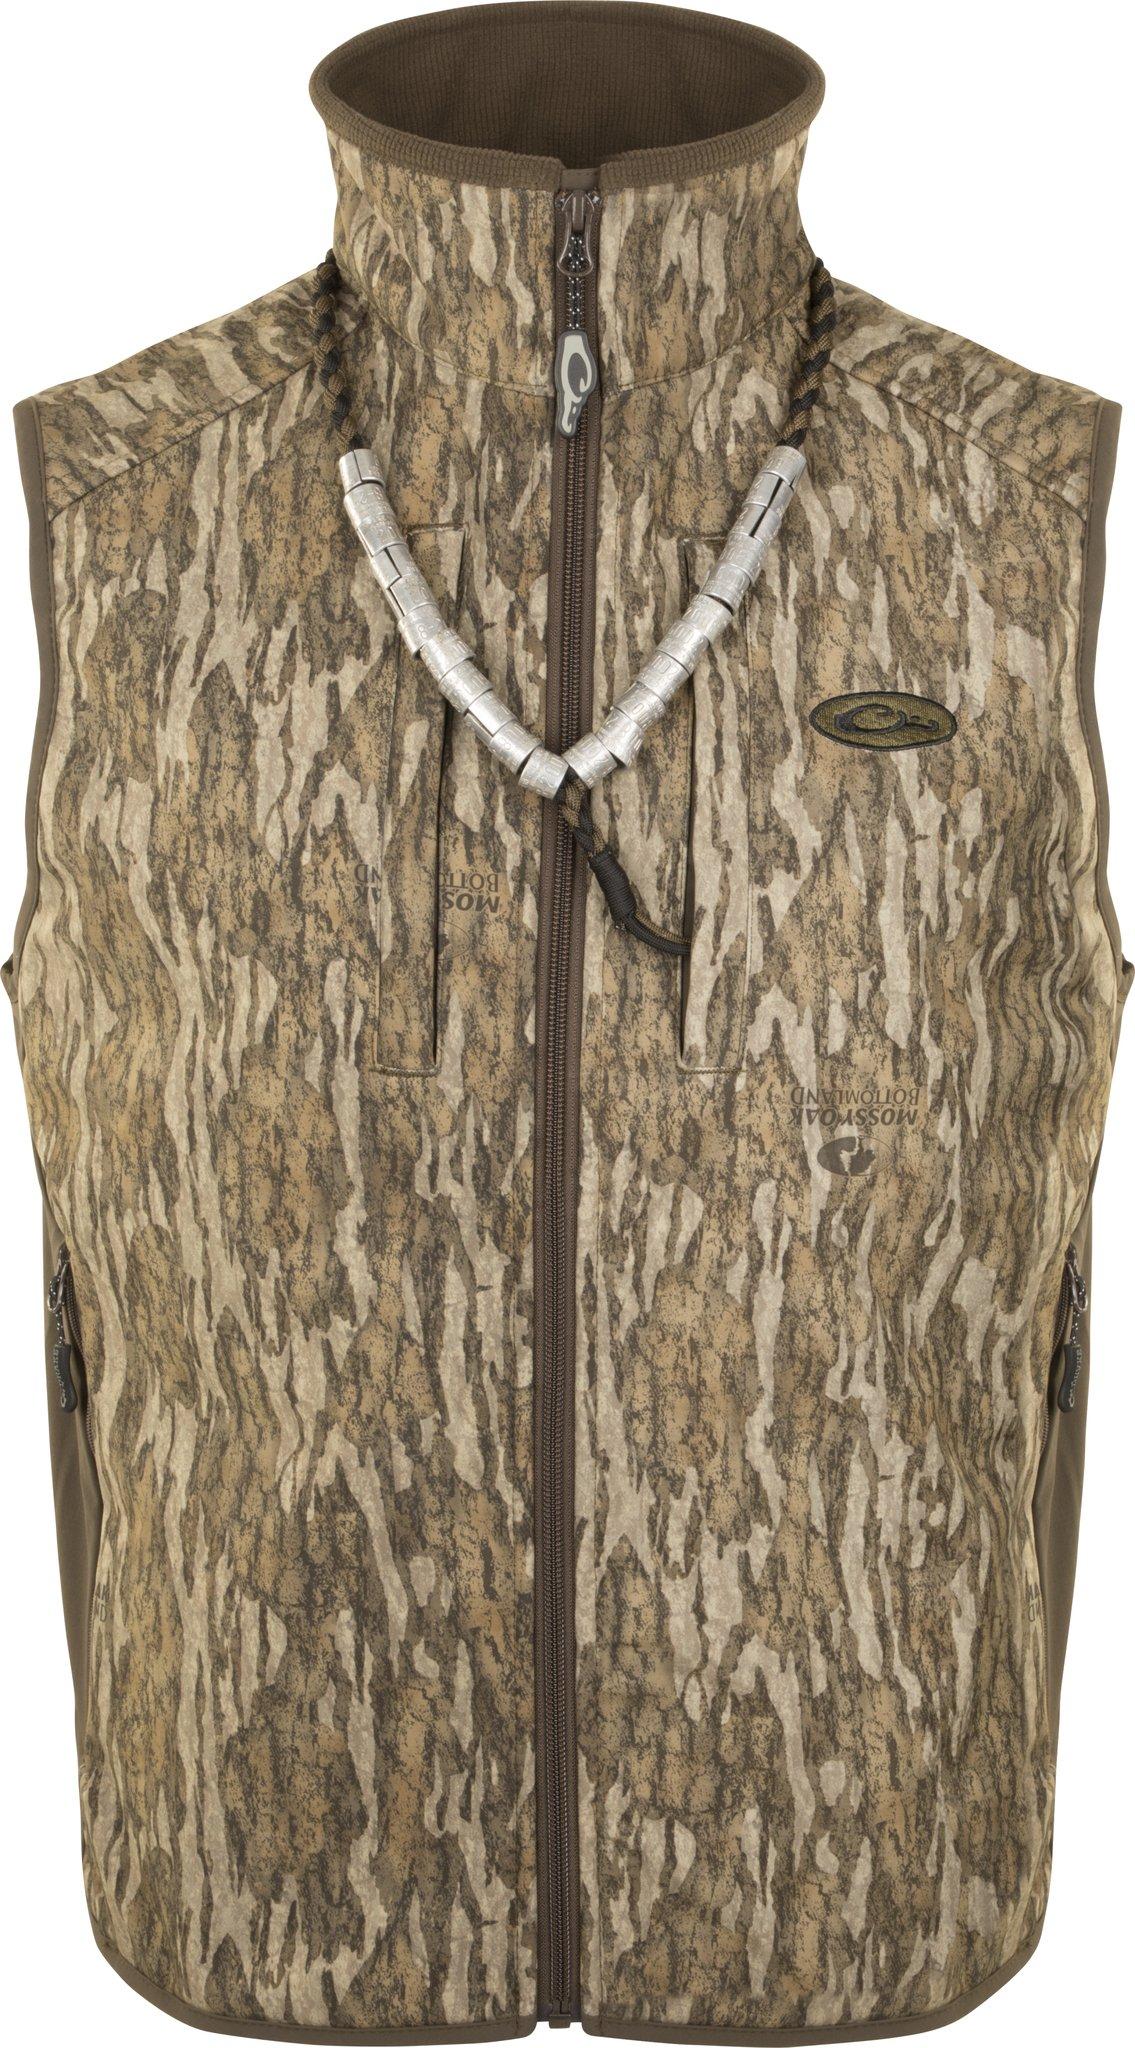 Drake EST Camo Windproof Tech Vest (Bottomland, Small)